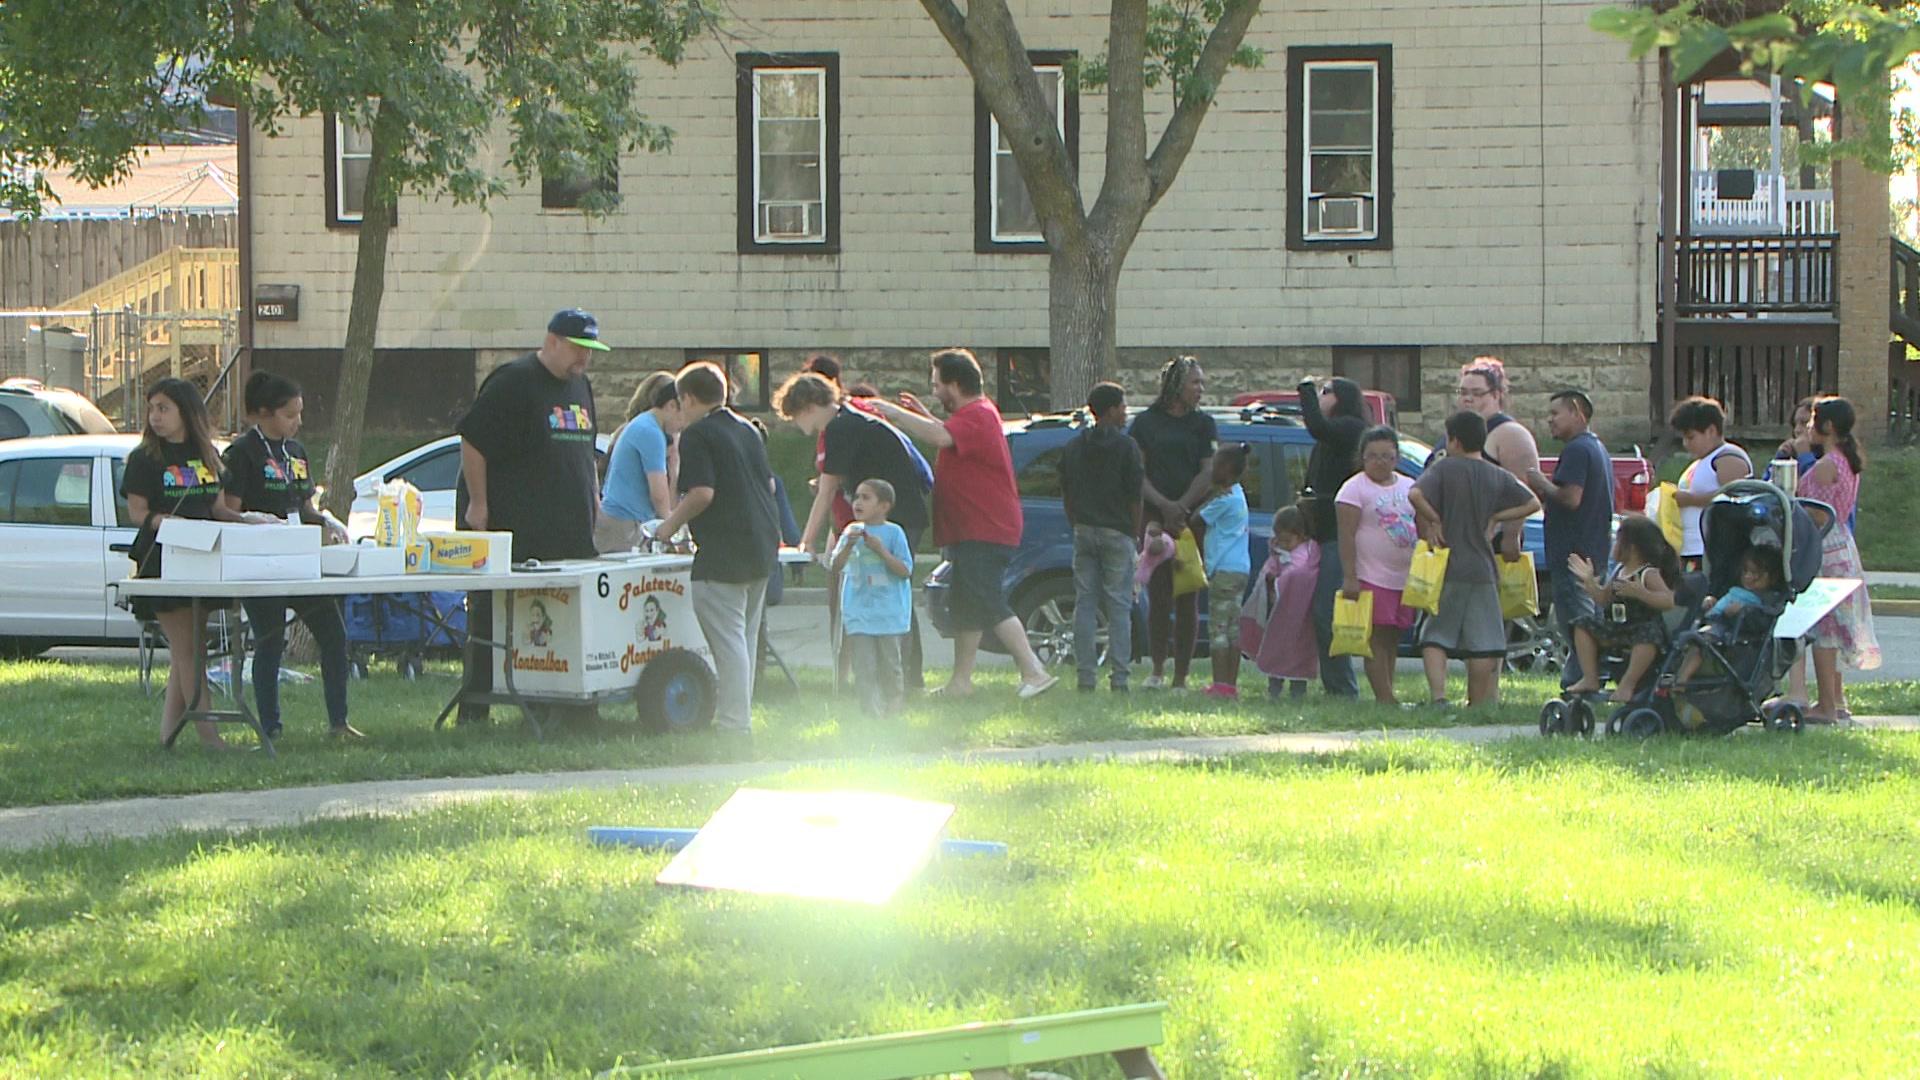 Muskego Way neighborhood holds block party at Reiske Park